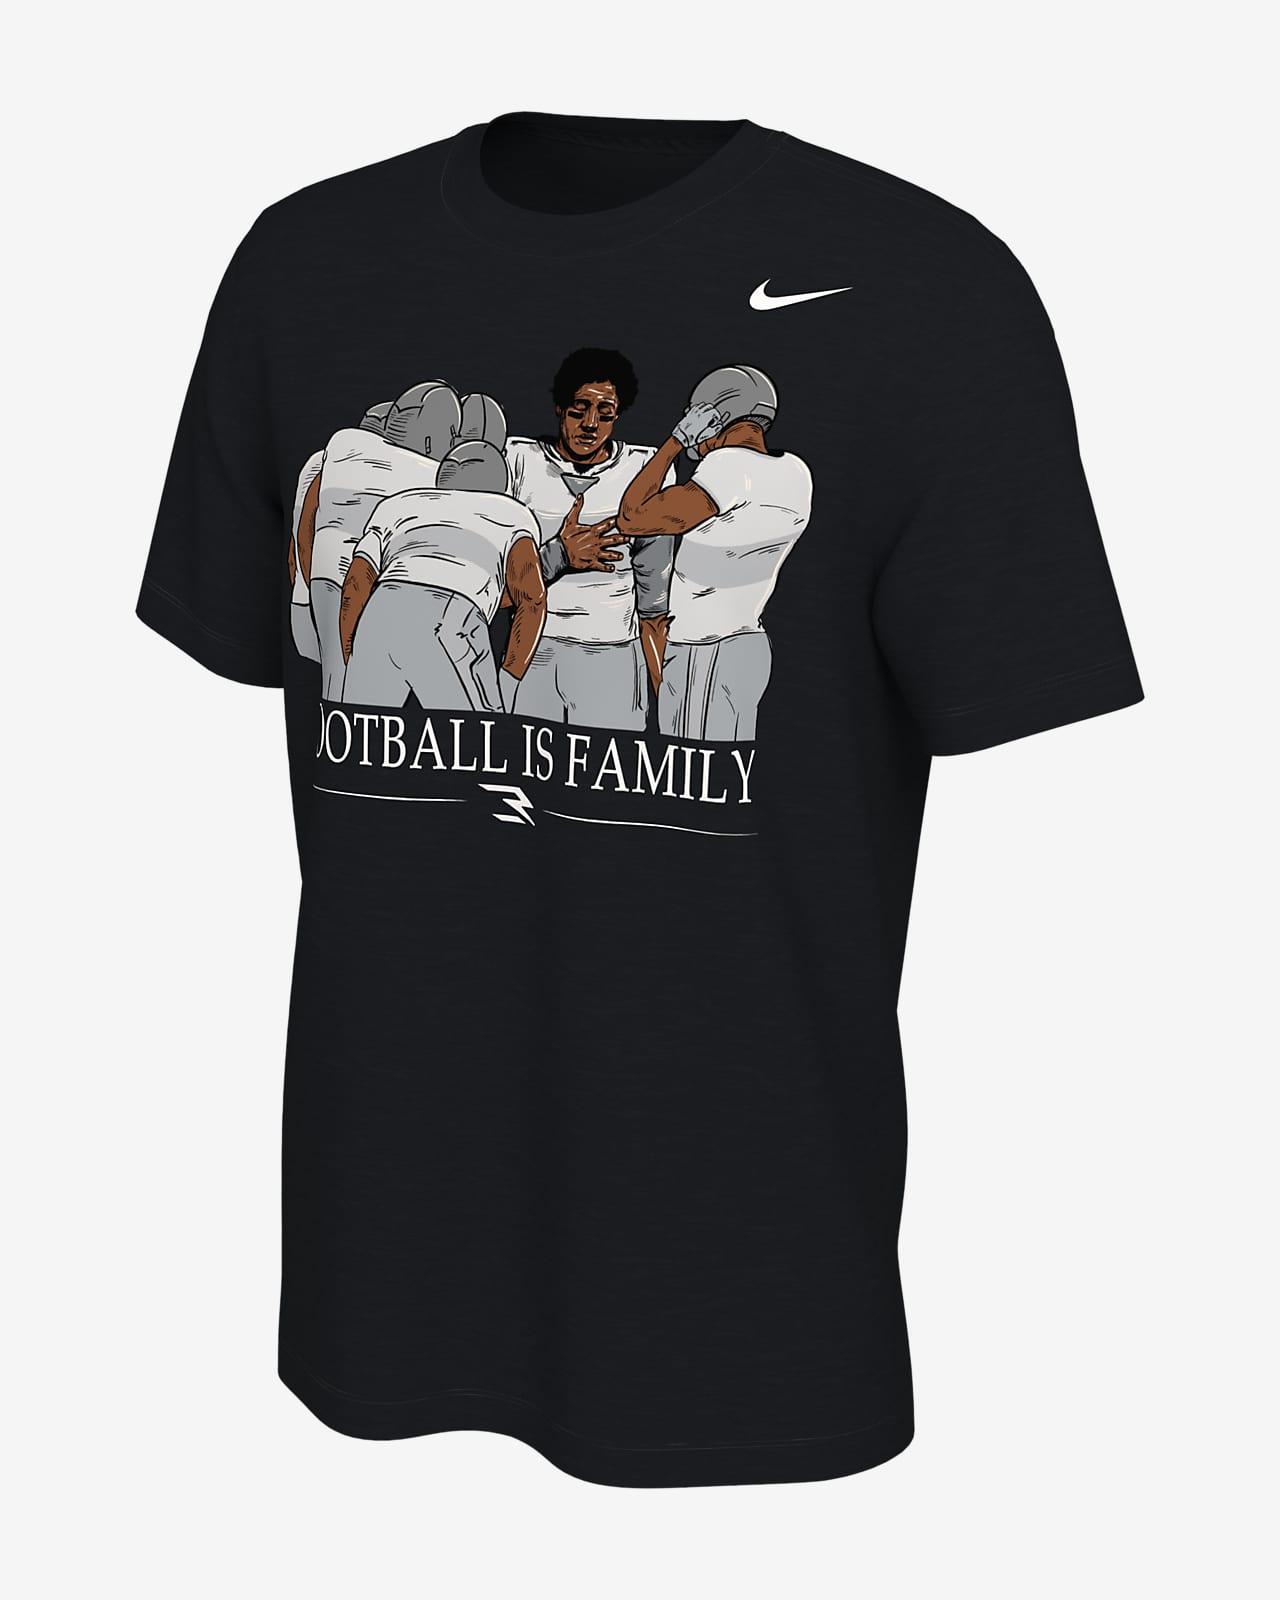 Nike Dri-FIT (Russell Wilson) Men's T-Shirt